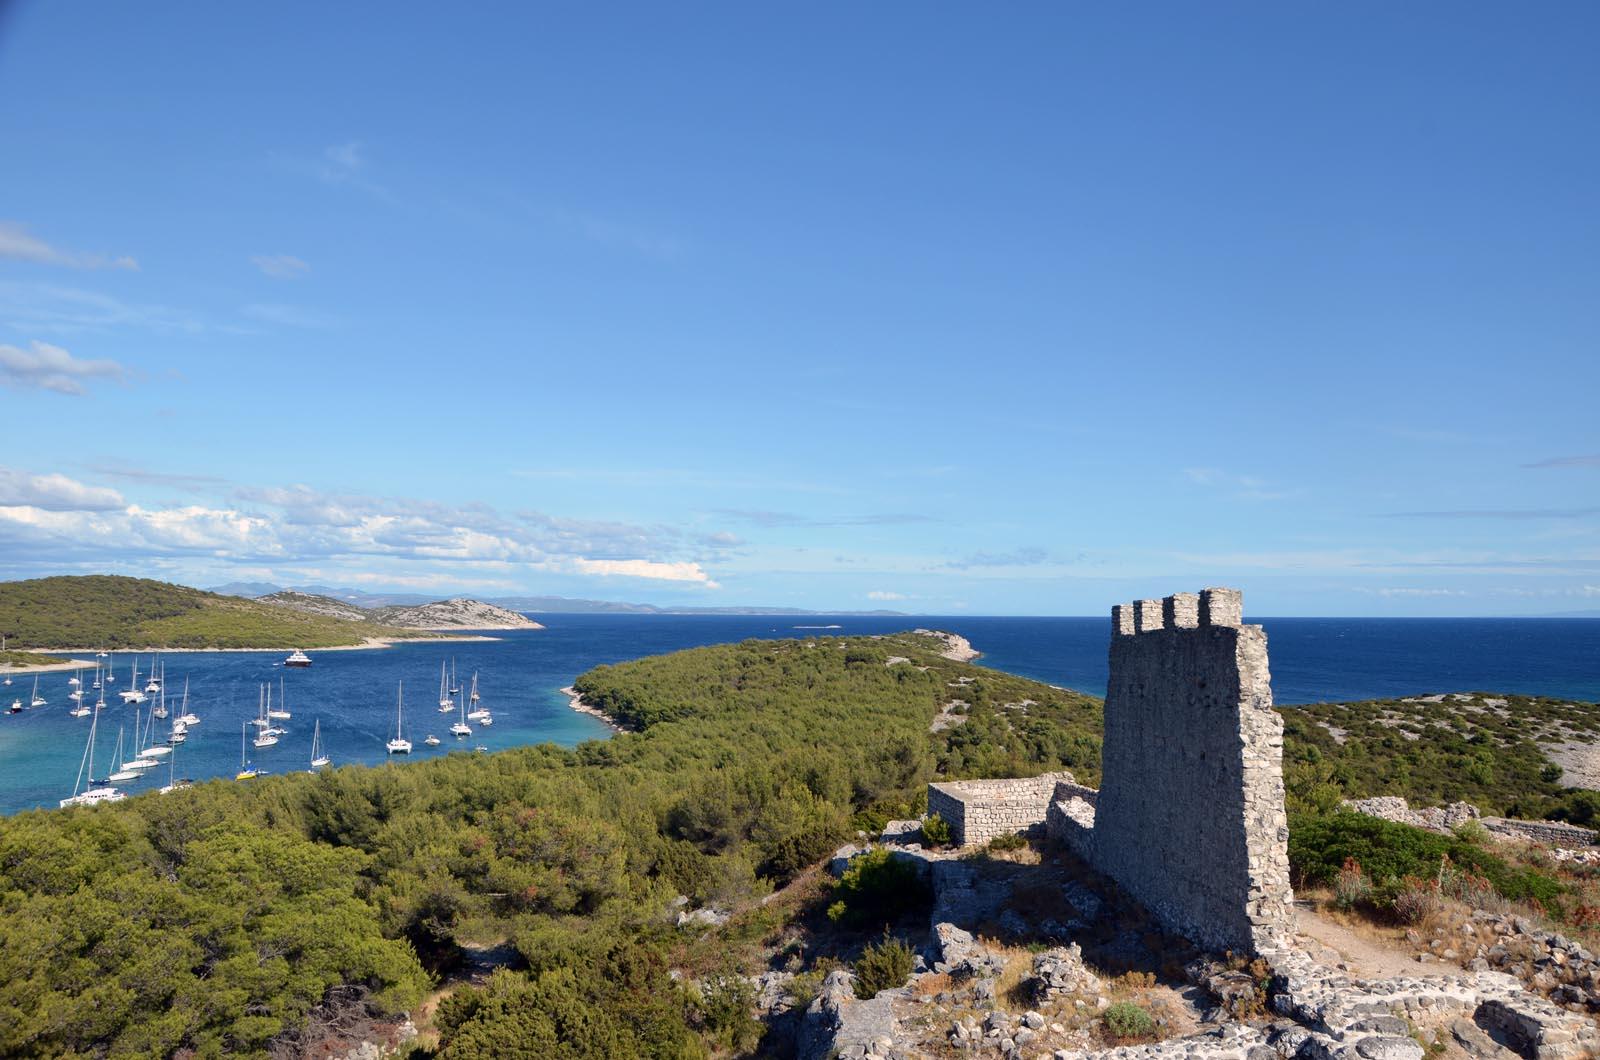 Croatia Sailing Destinations - Žirje